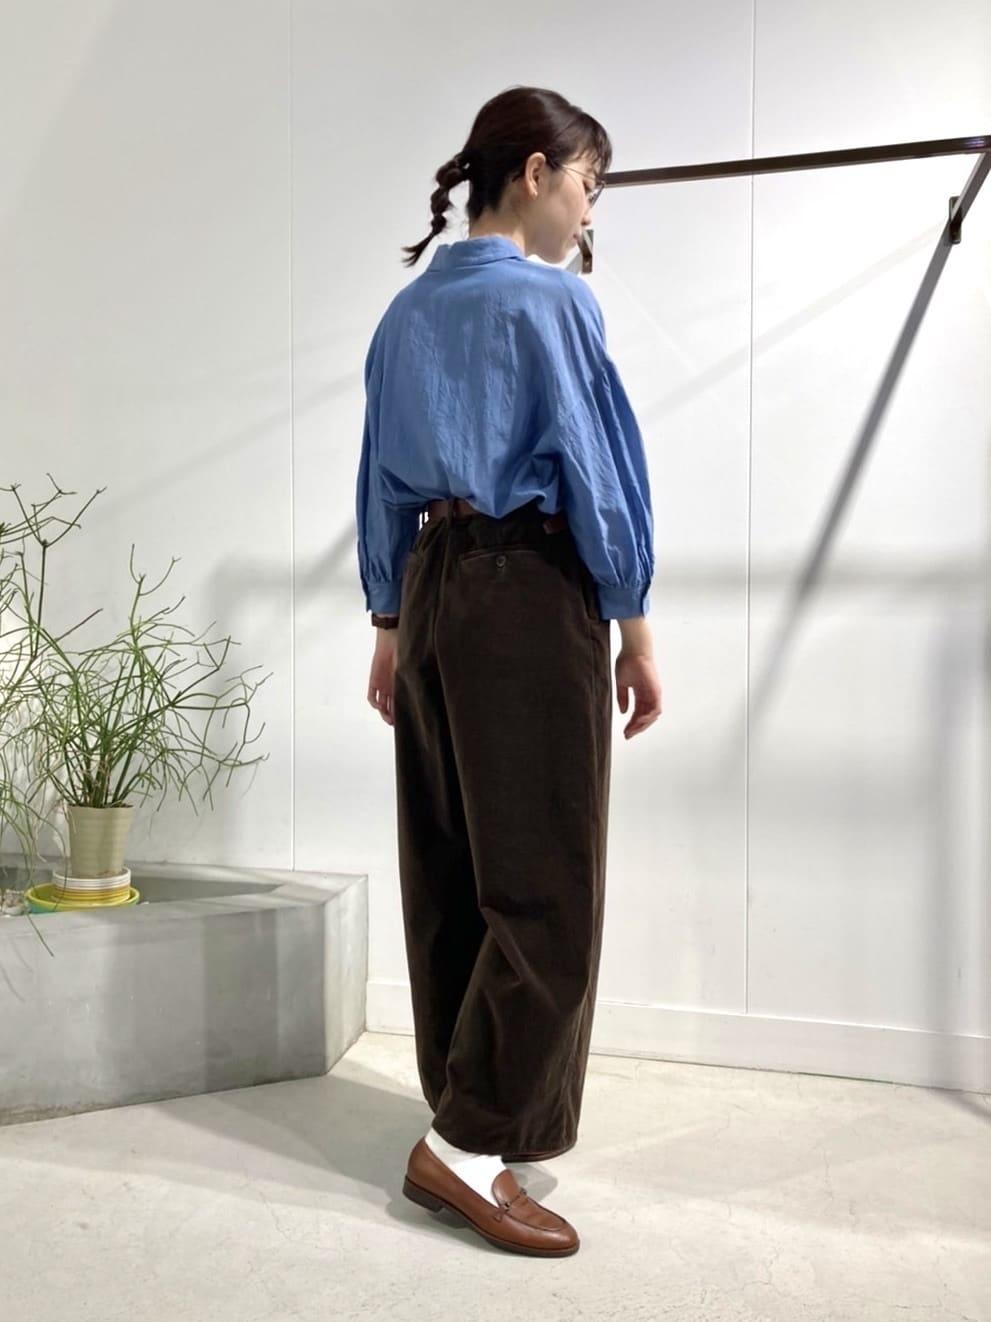 l'atelier du savon 名古屋栄路面 身長:161cm 2021.09.08